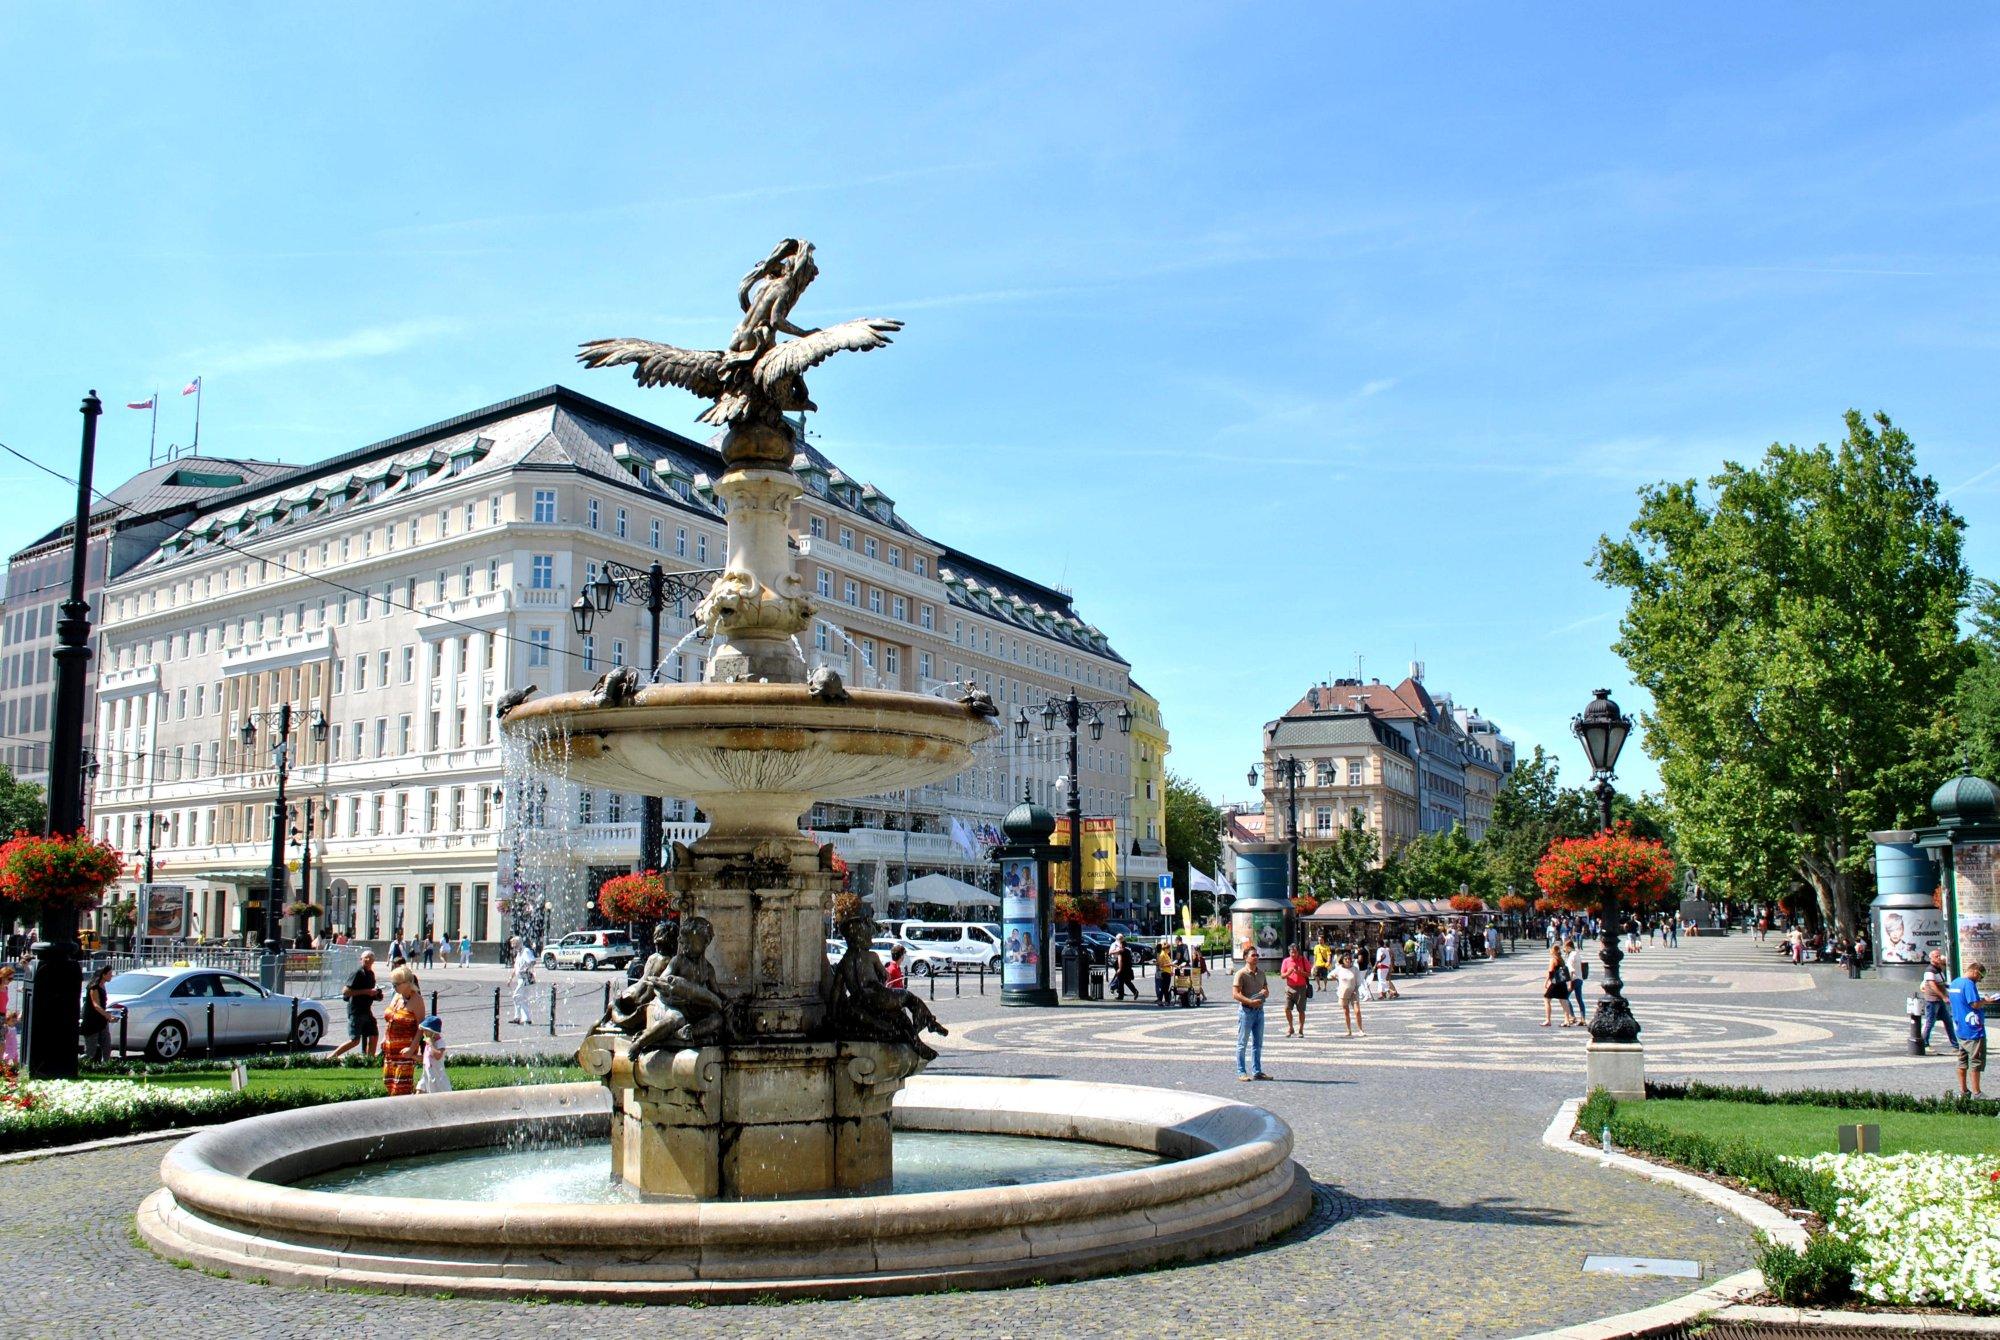 DSC 0134 Bratislava